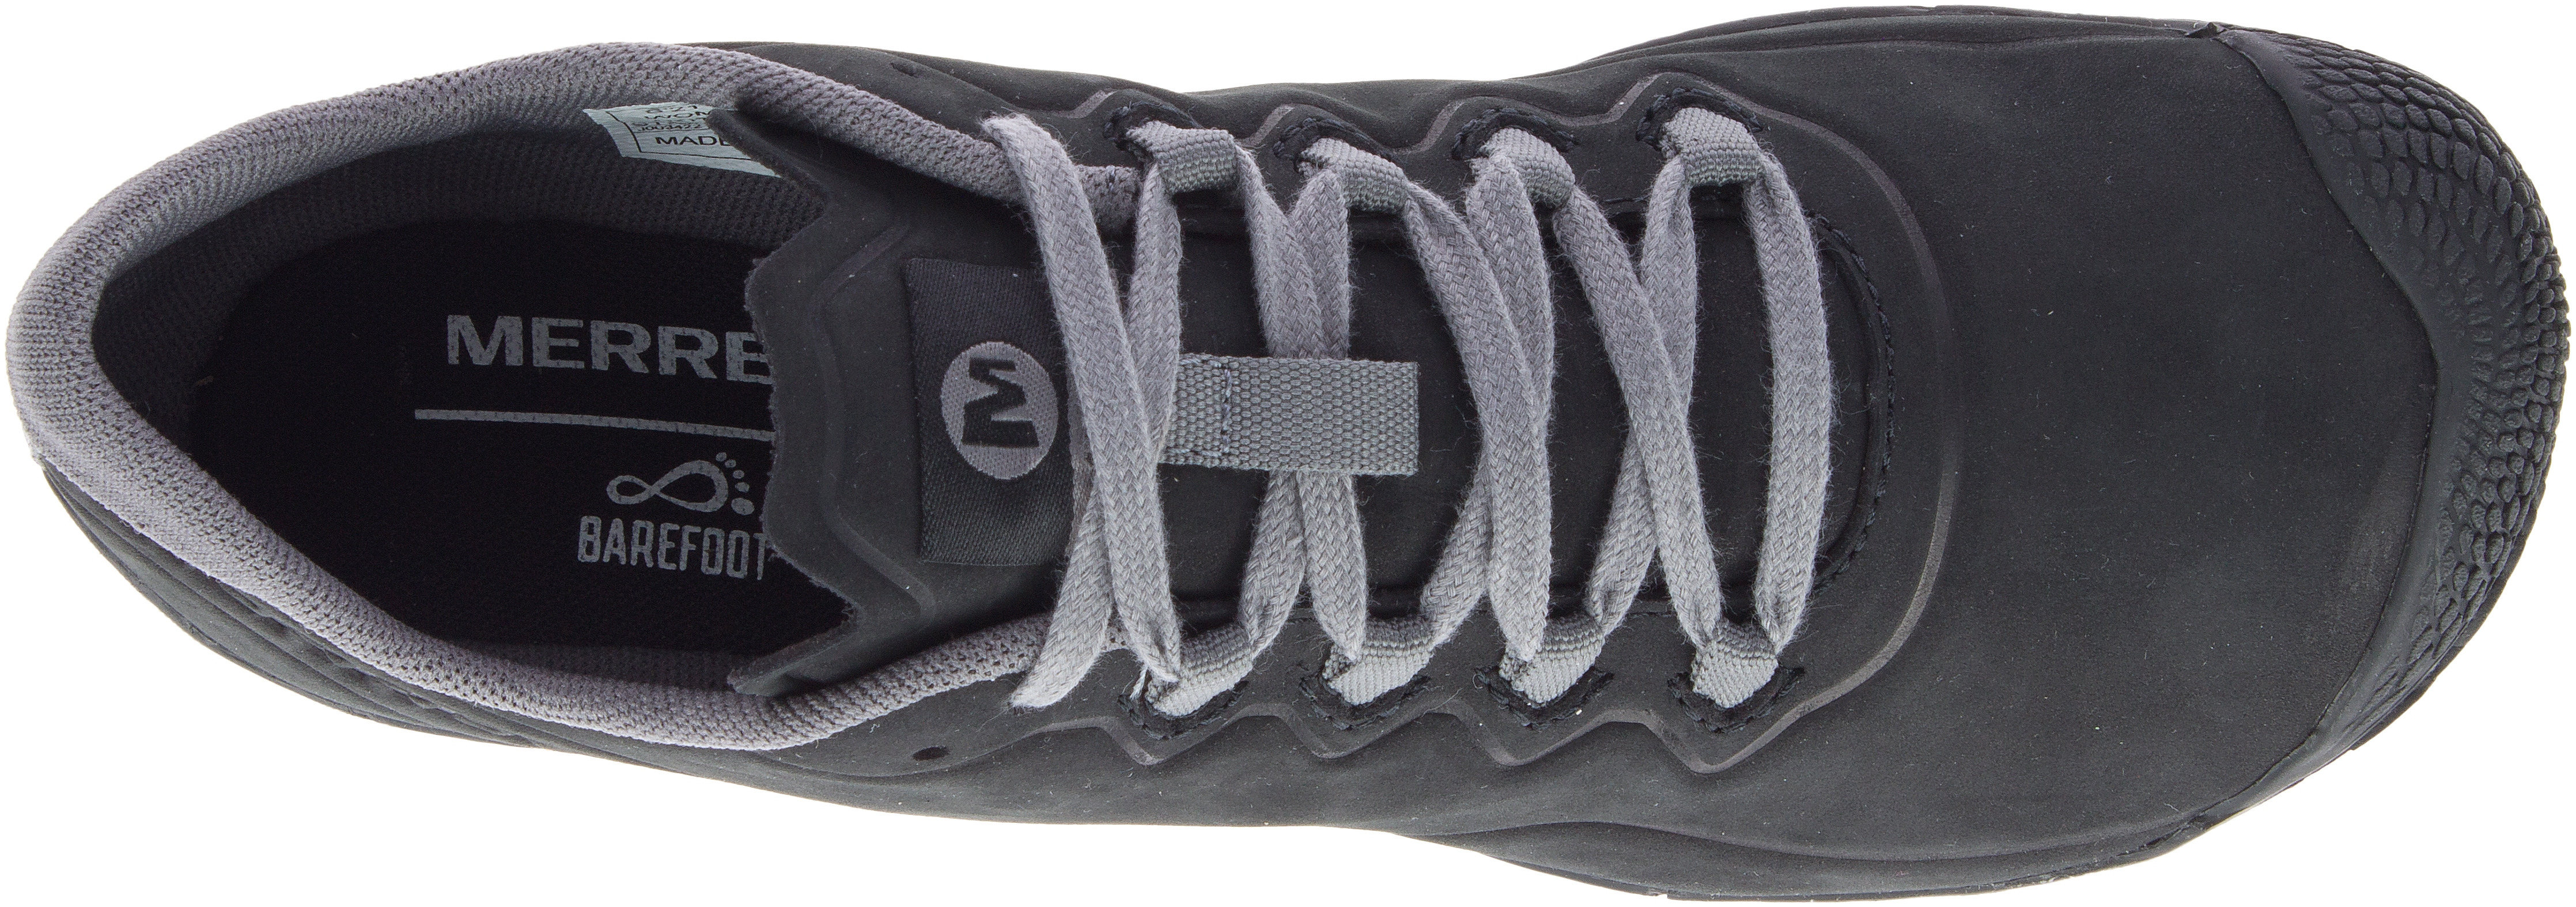 Vapor Glove Luna 3 Leather, Black-Charcoal